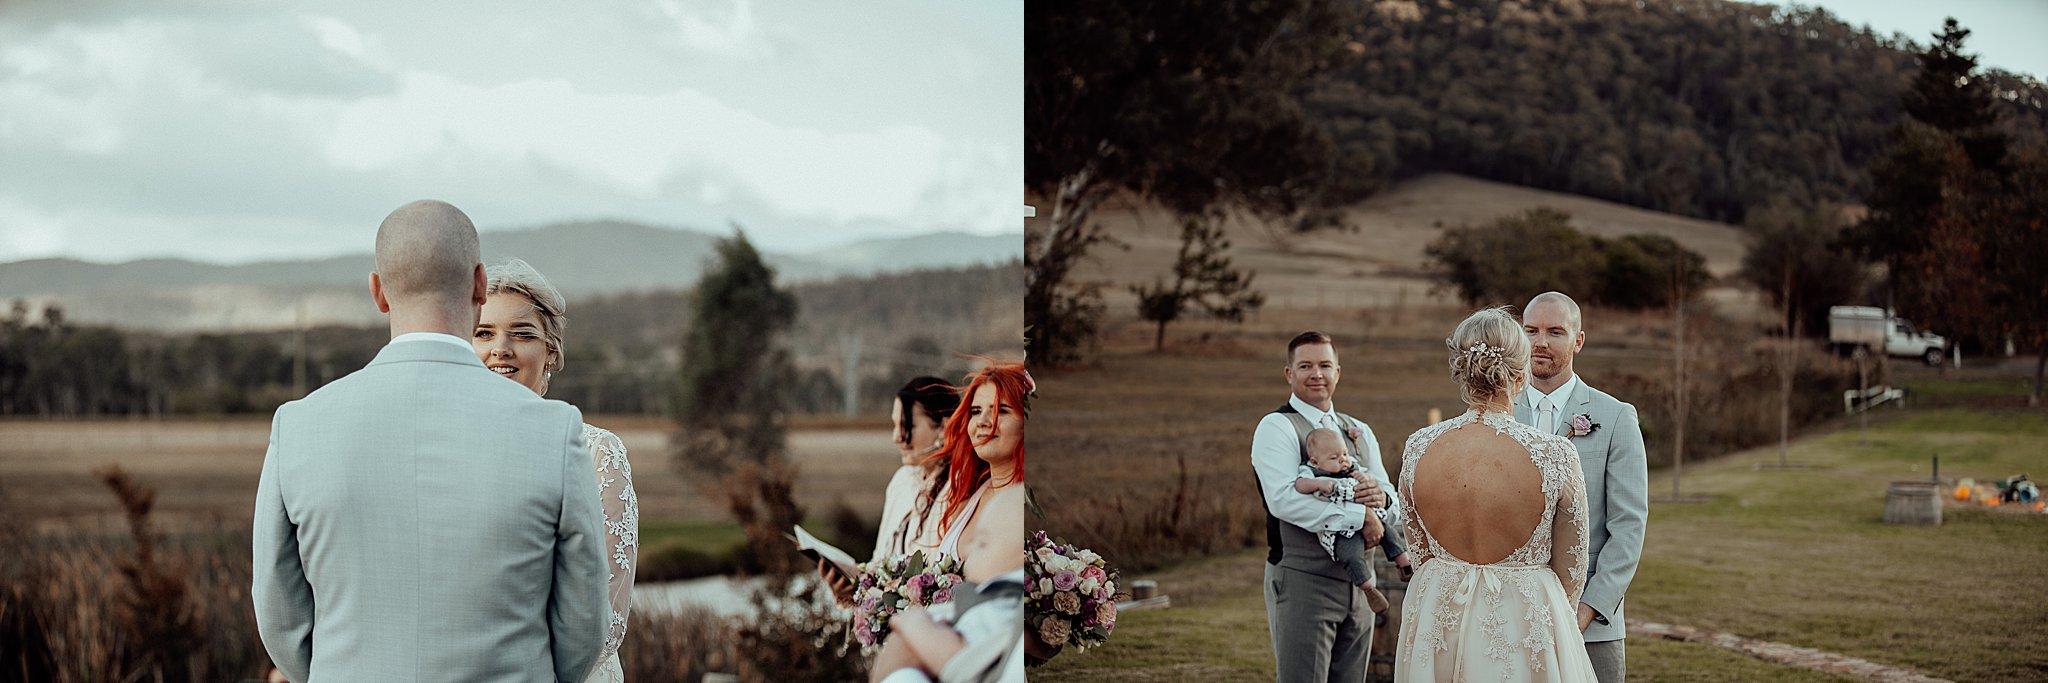 mickalathomas_puremacphotography_weddingphotographer_couplephotographer_Sheppartonphotographer_3427.jpg